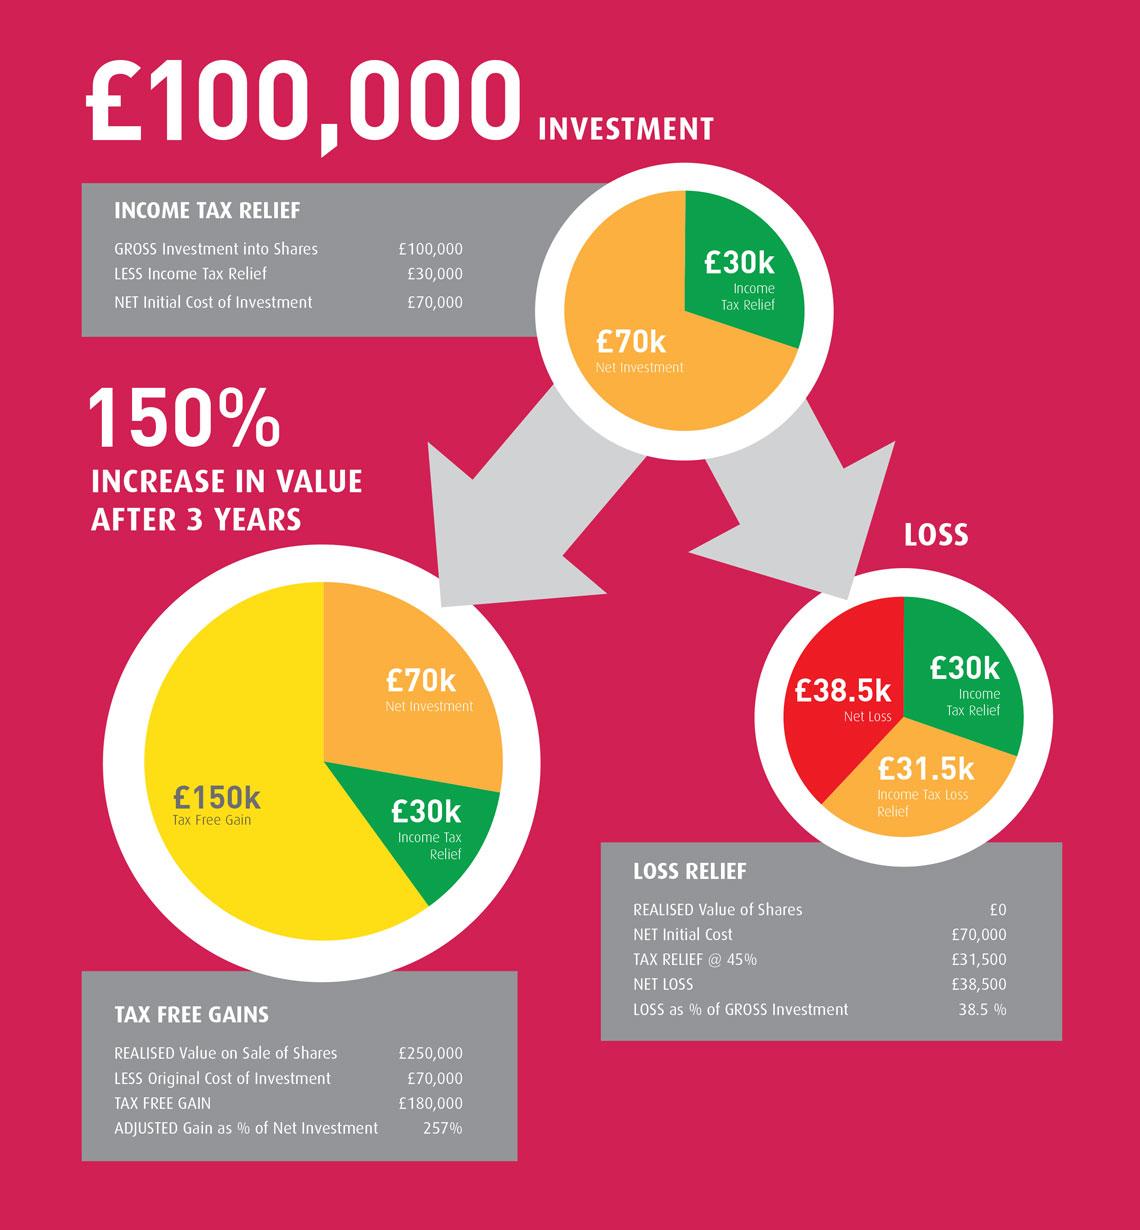 enterprise-investment-scheme-working-examples-1-2